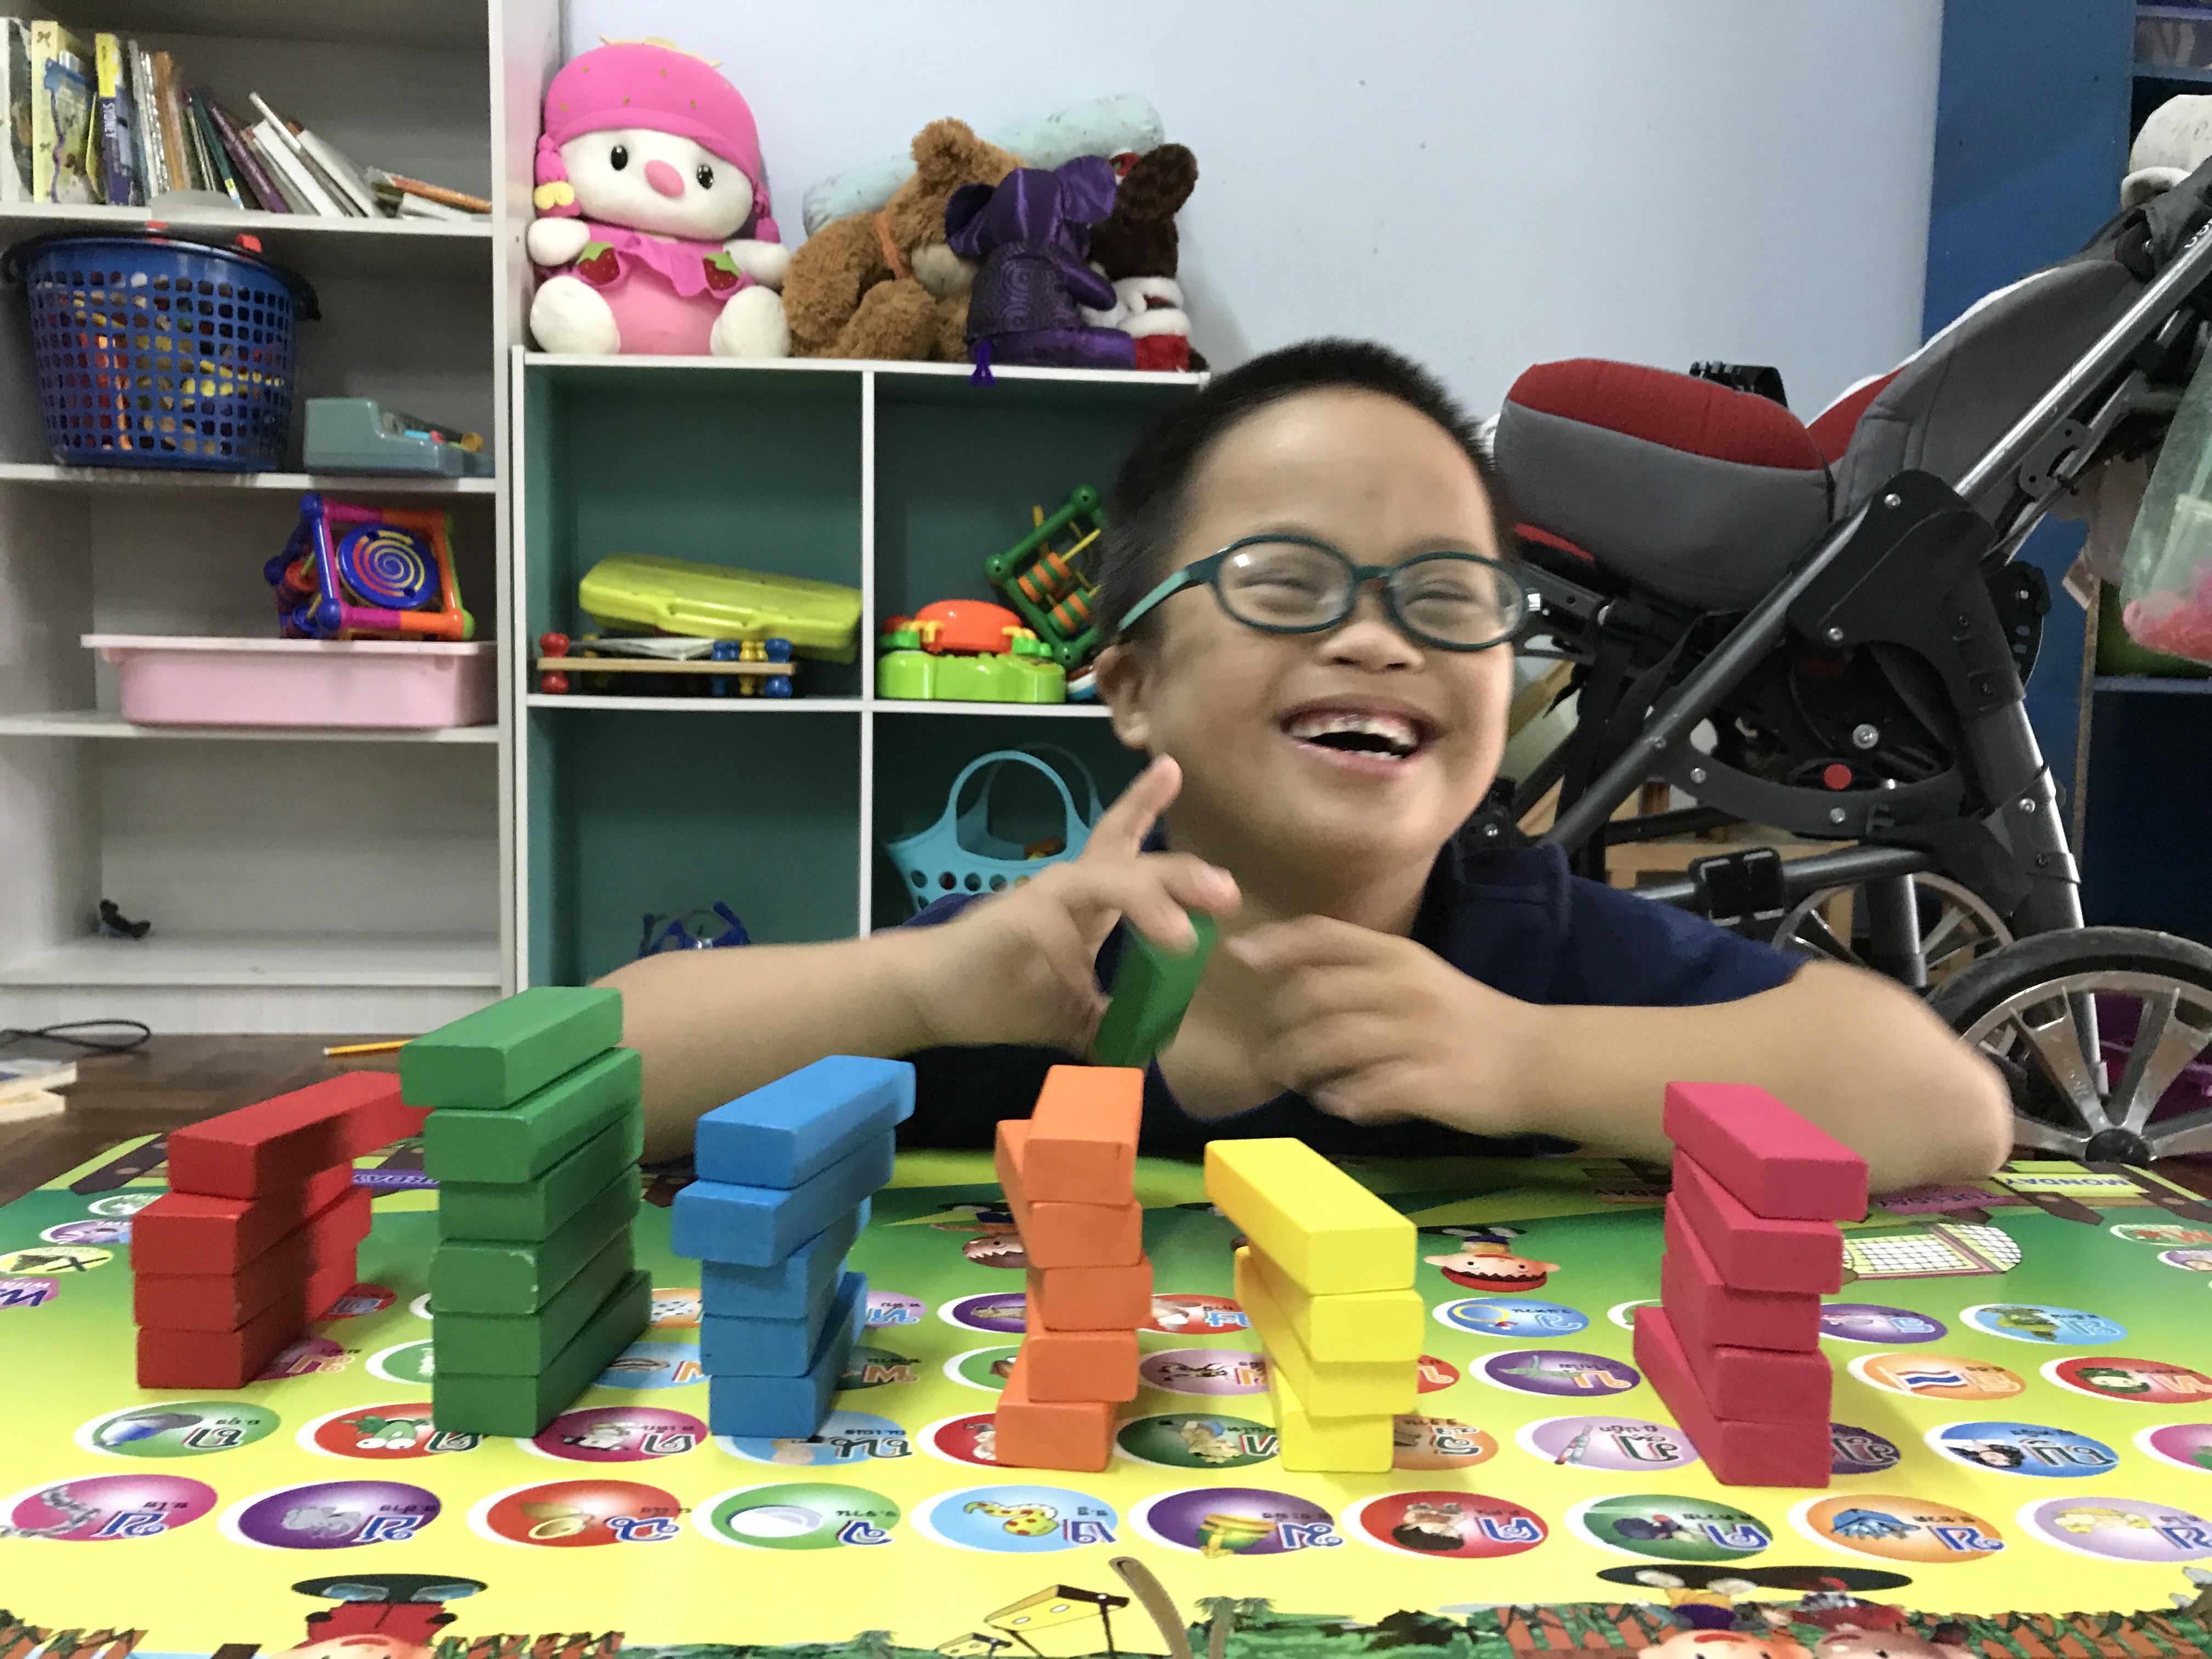 LeLe arranging colored blocks